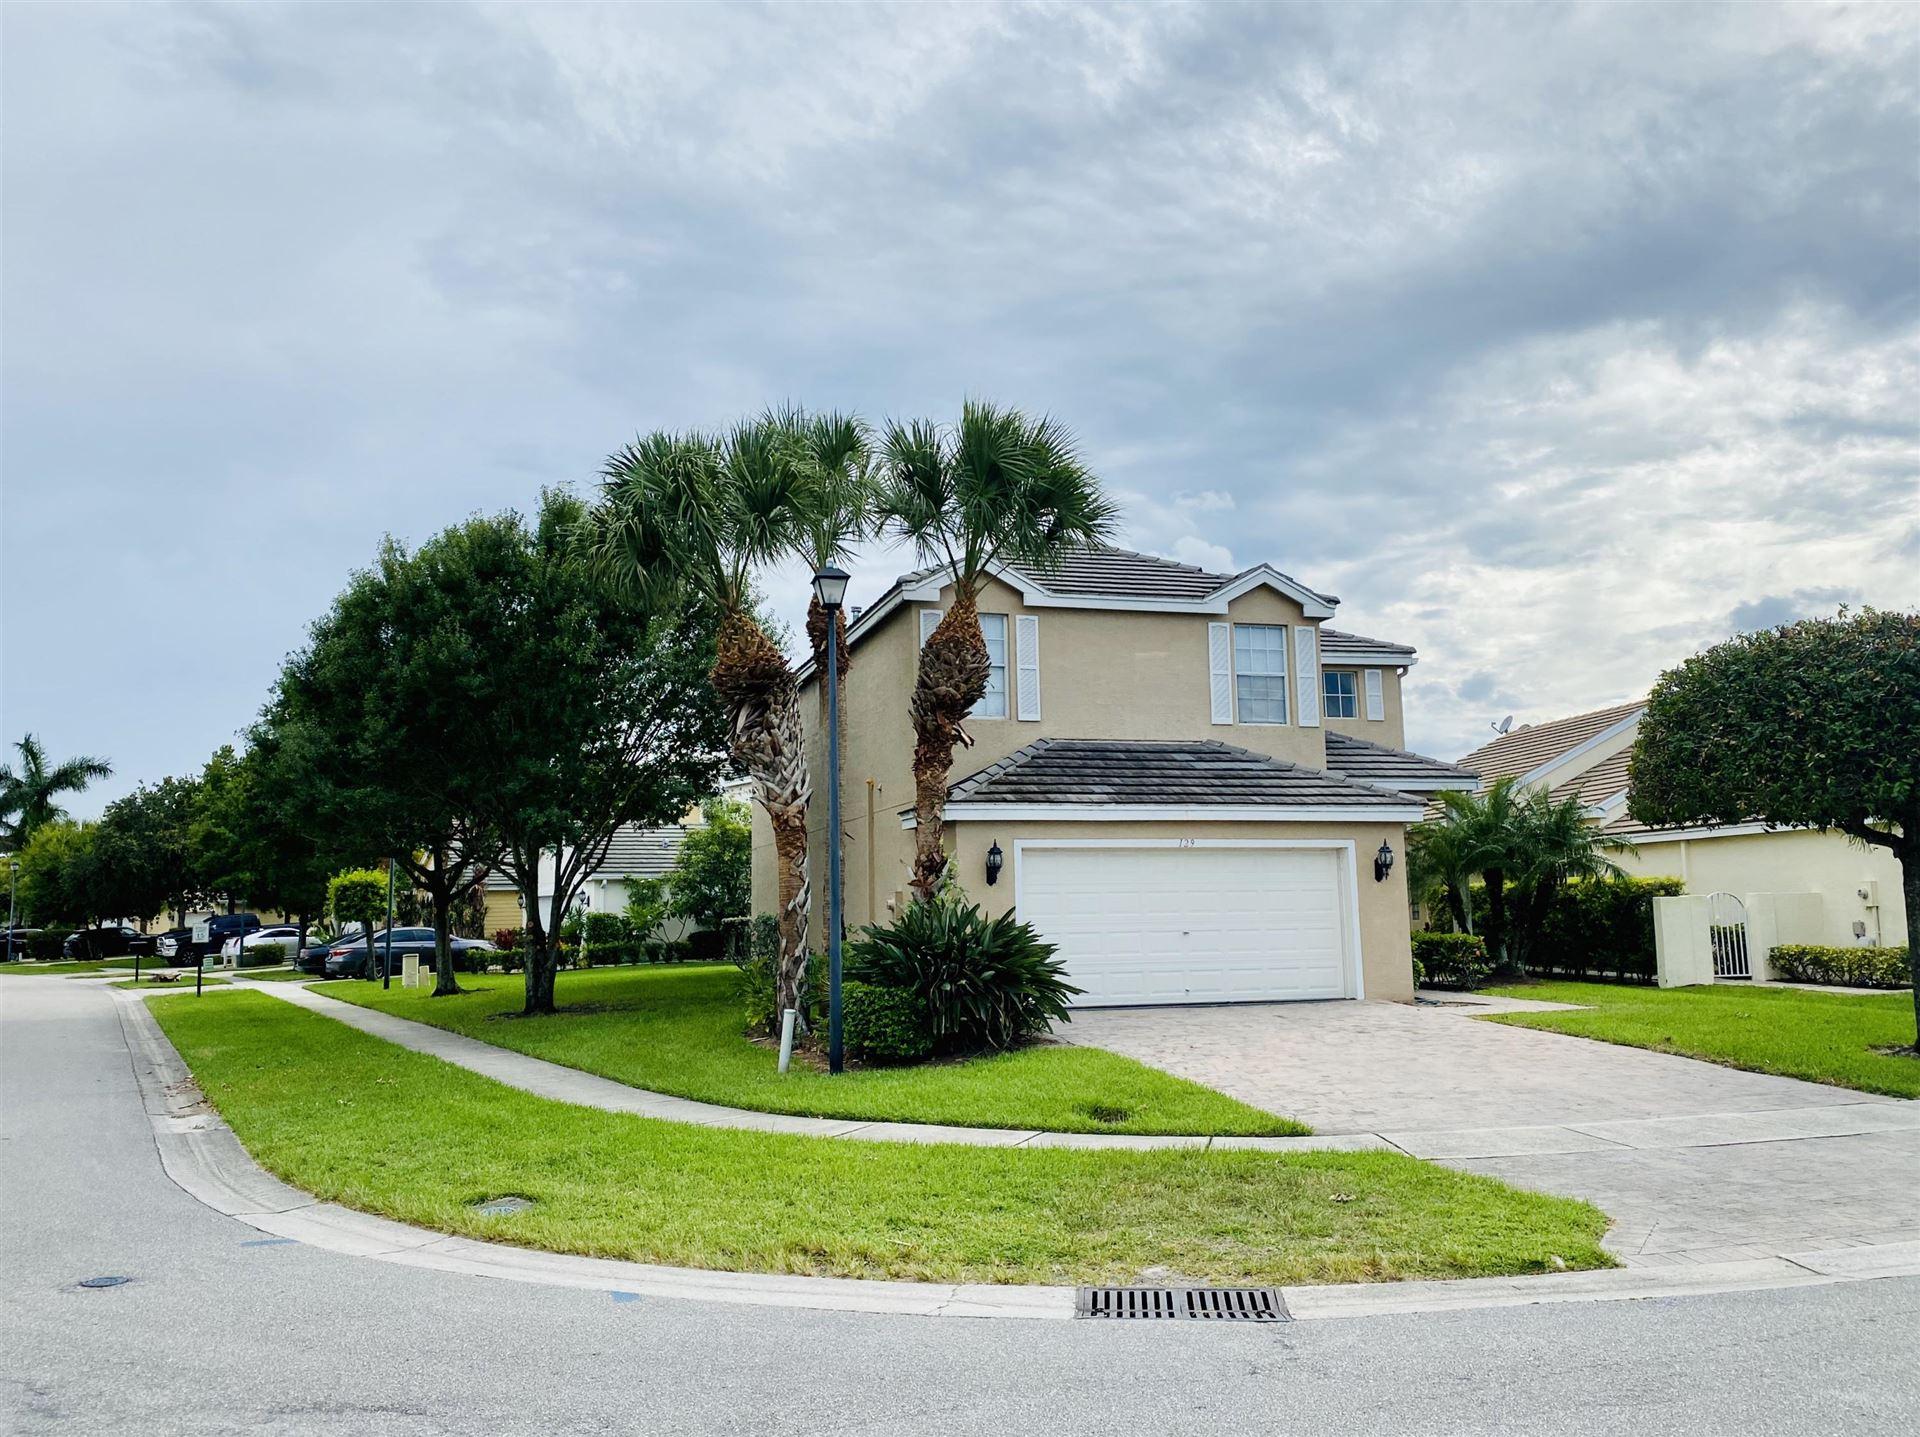 129 Hamilton Terrace, Royal Palm Beach, FL 33414 - #: RX-10628938